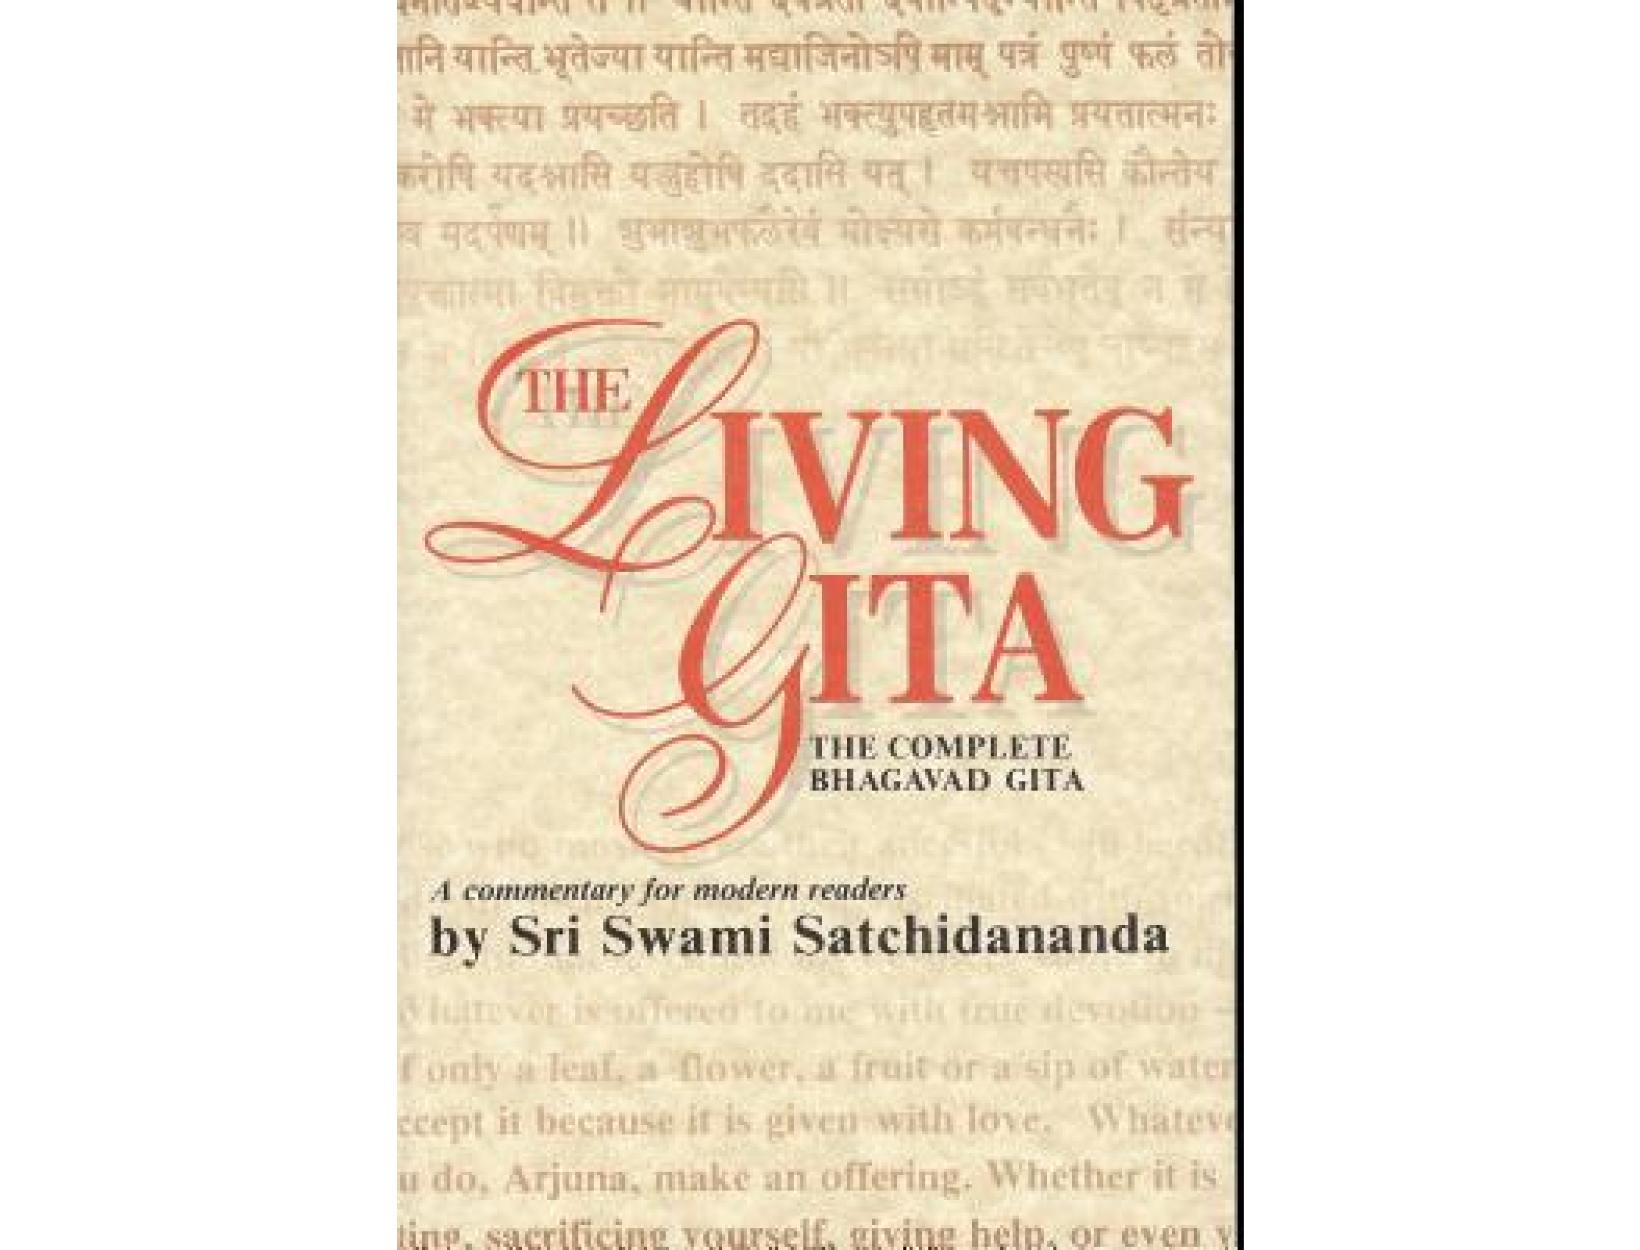 <em>Living Gita: The Complete Bhagavad Gita</em> by Sri Swami Satchidananda